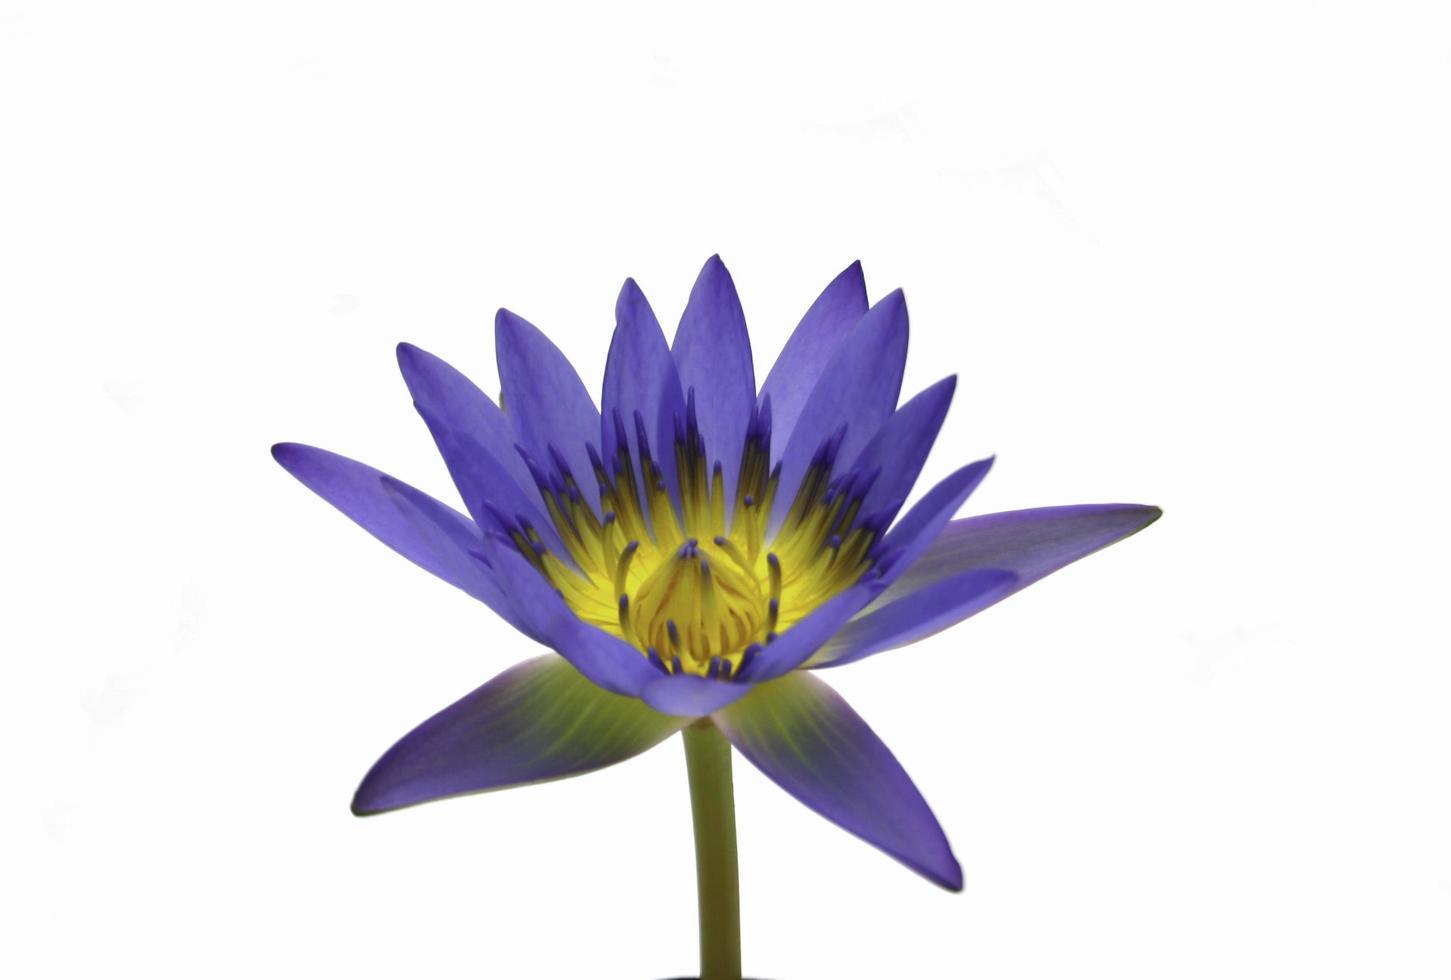 Lotusblume isoliert foto